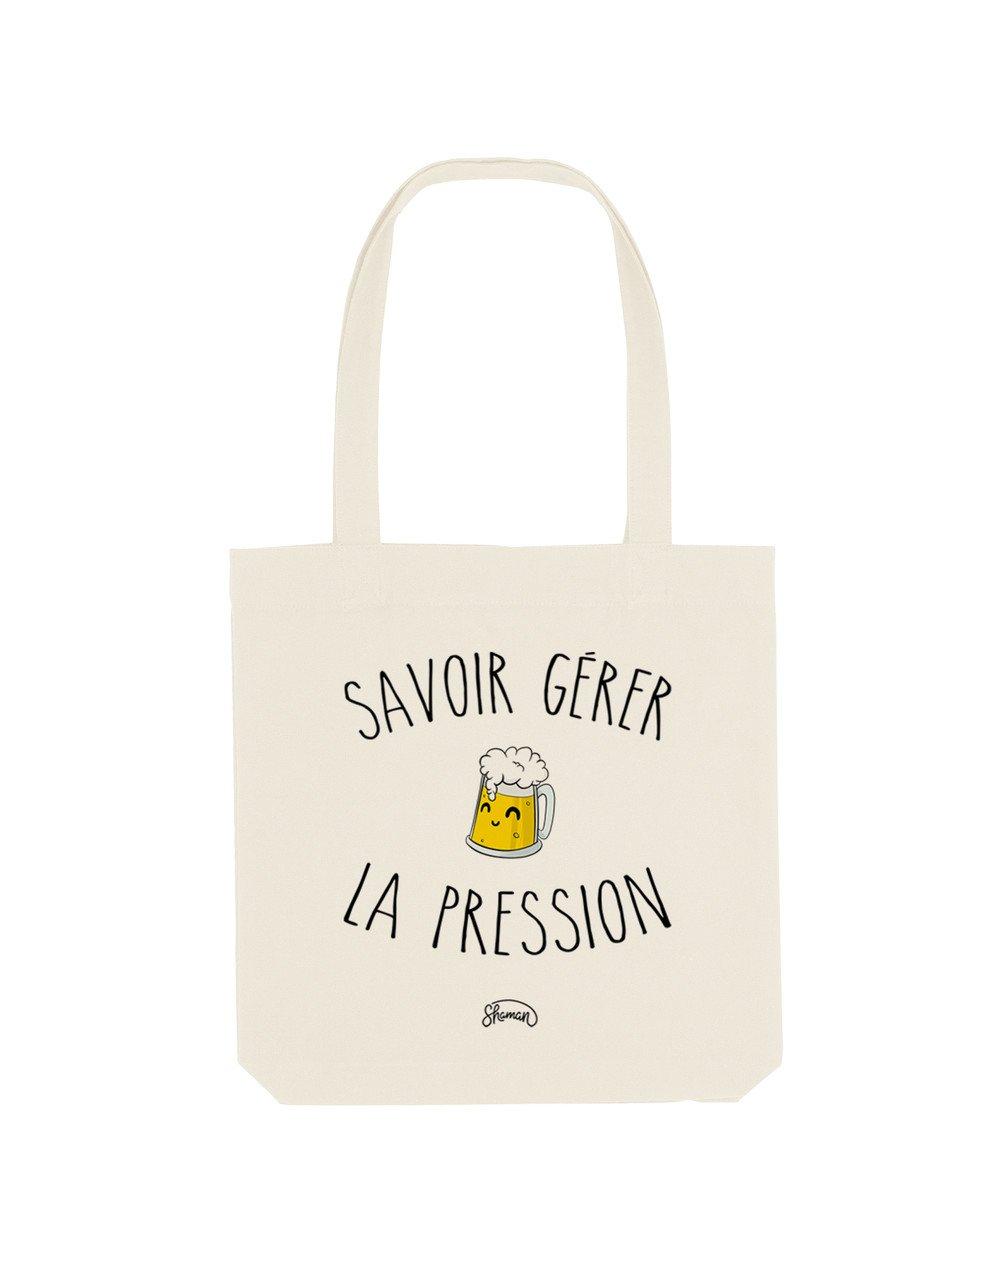 LA PRESSION - Tote Bag  Natural  en coton